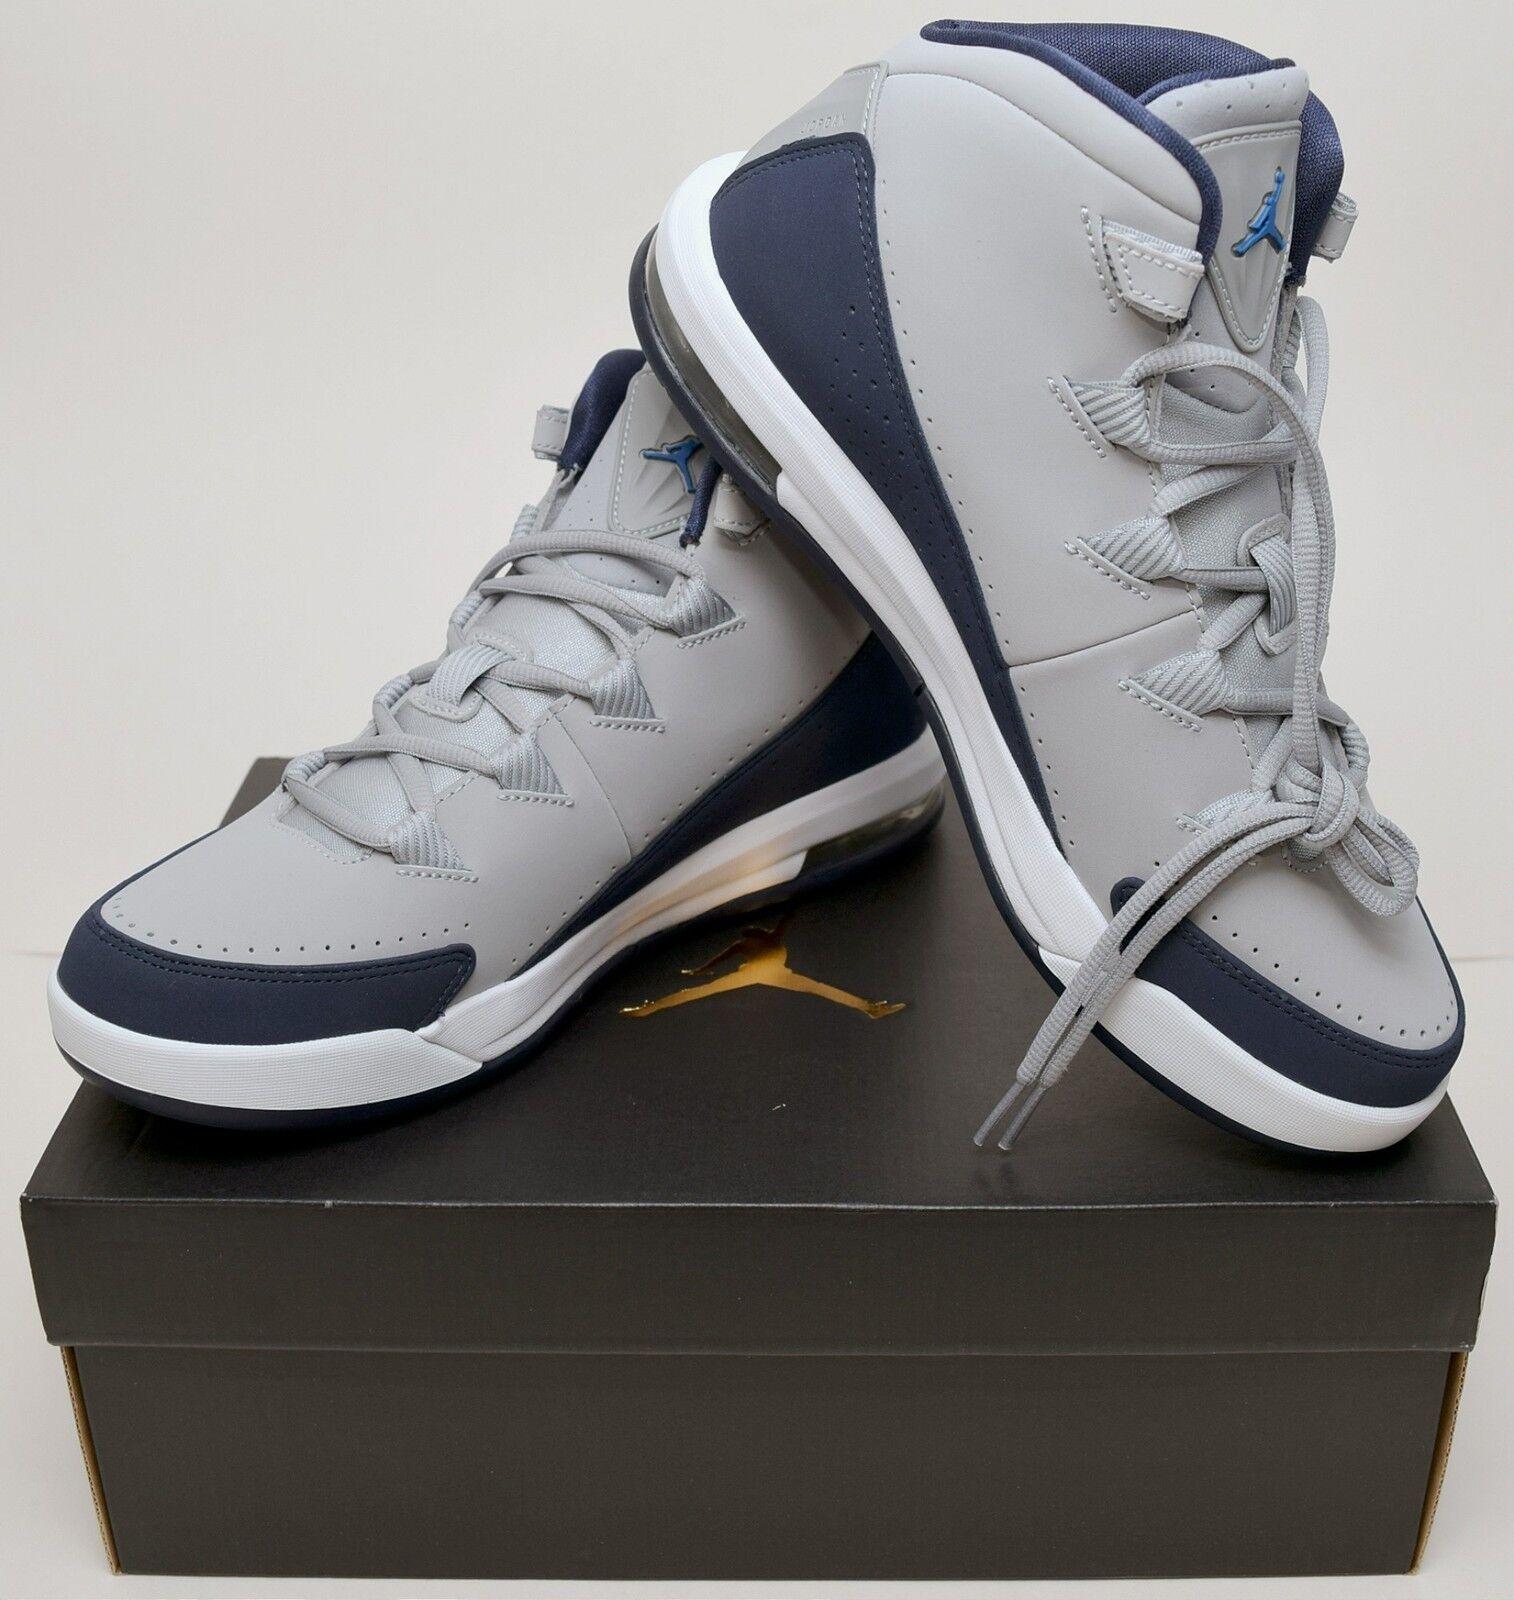 nike jordan air 5 where to get basketball shoes